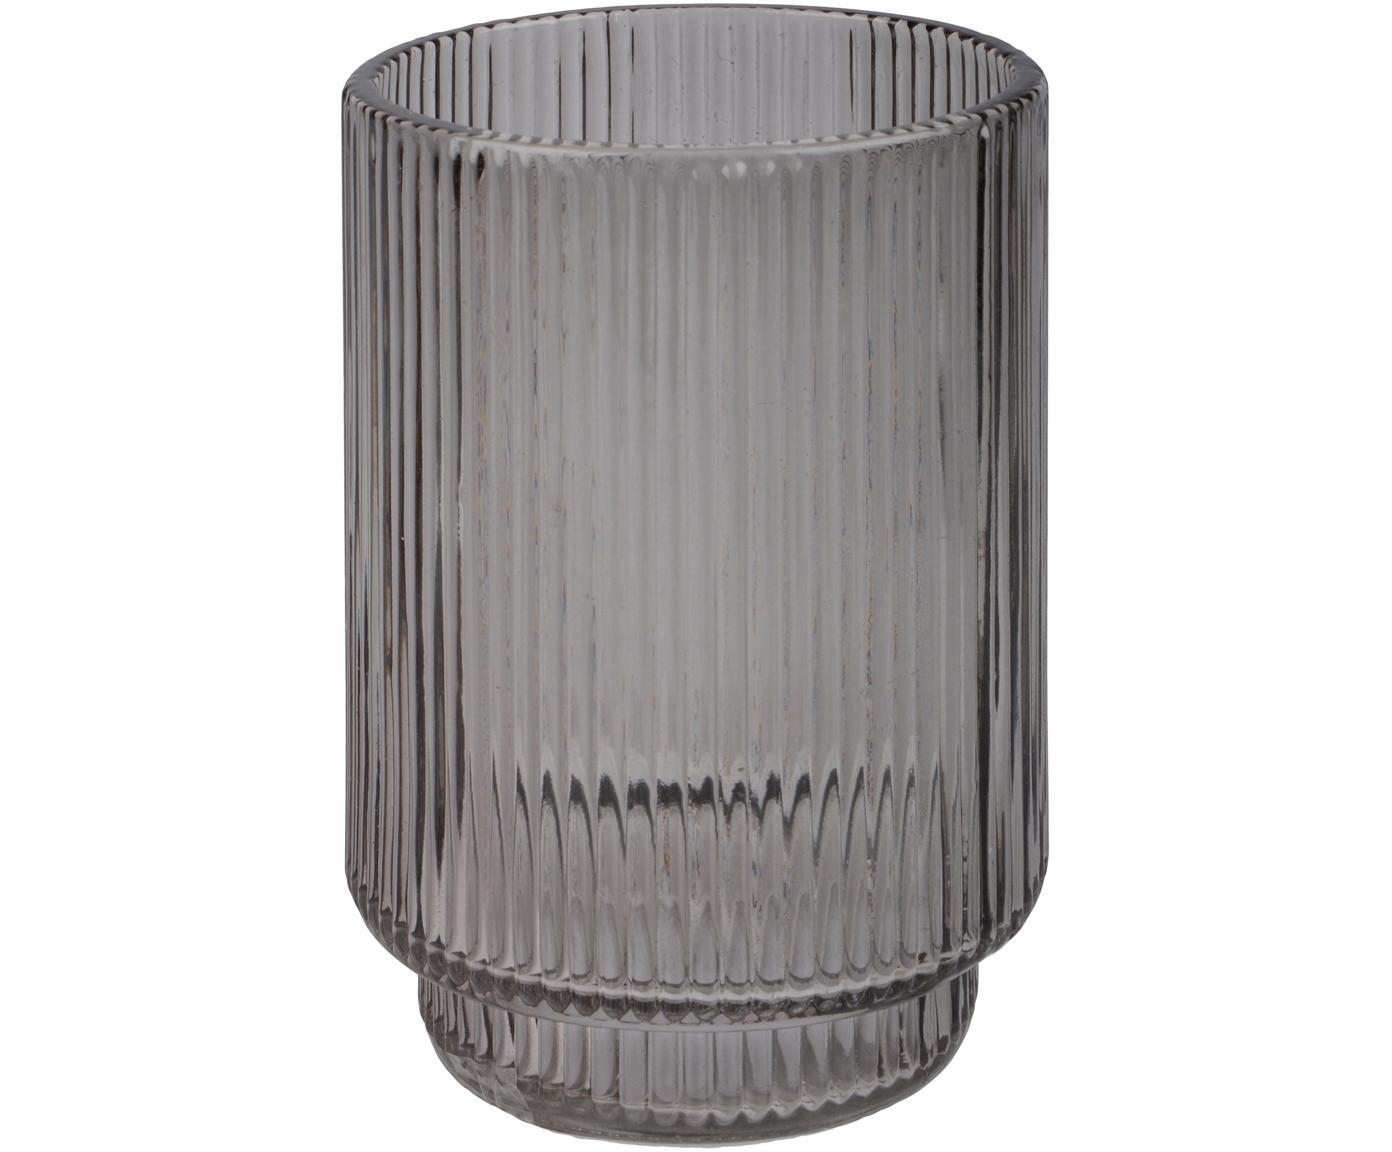 Vaso cepillo de dientes Ligia, Vidrio, Gris, transparente, Ø 8 x Al 10 cm